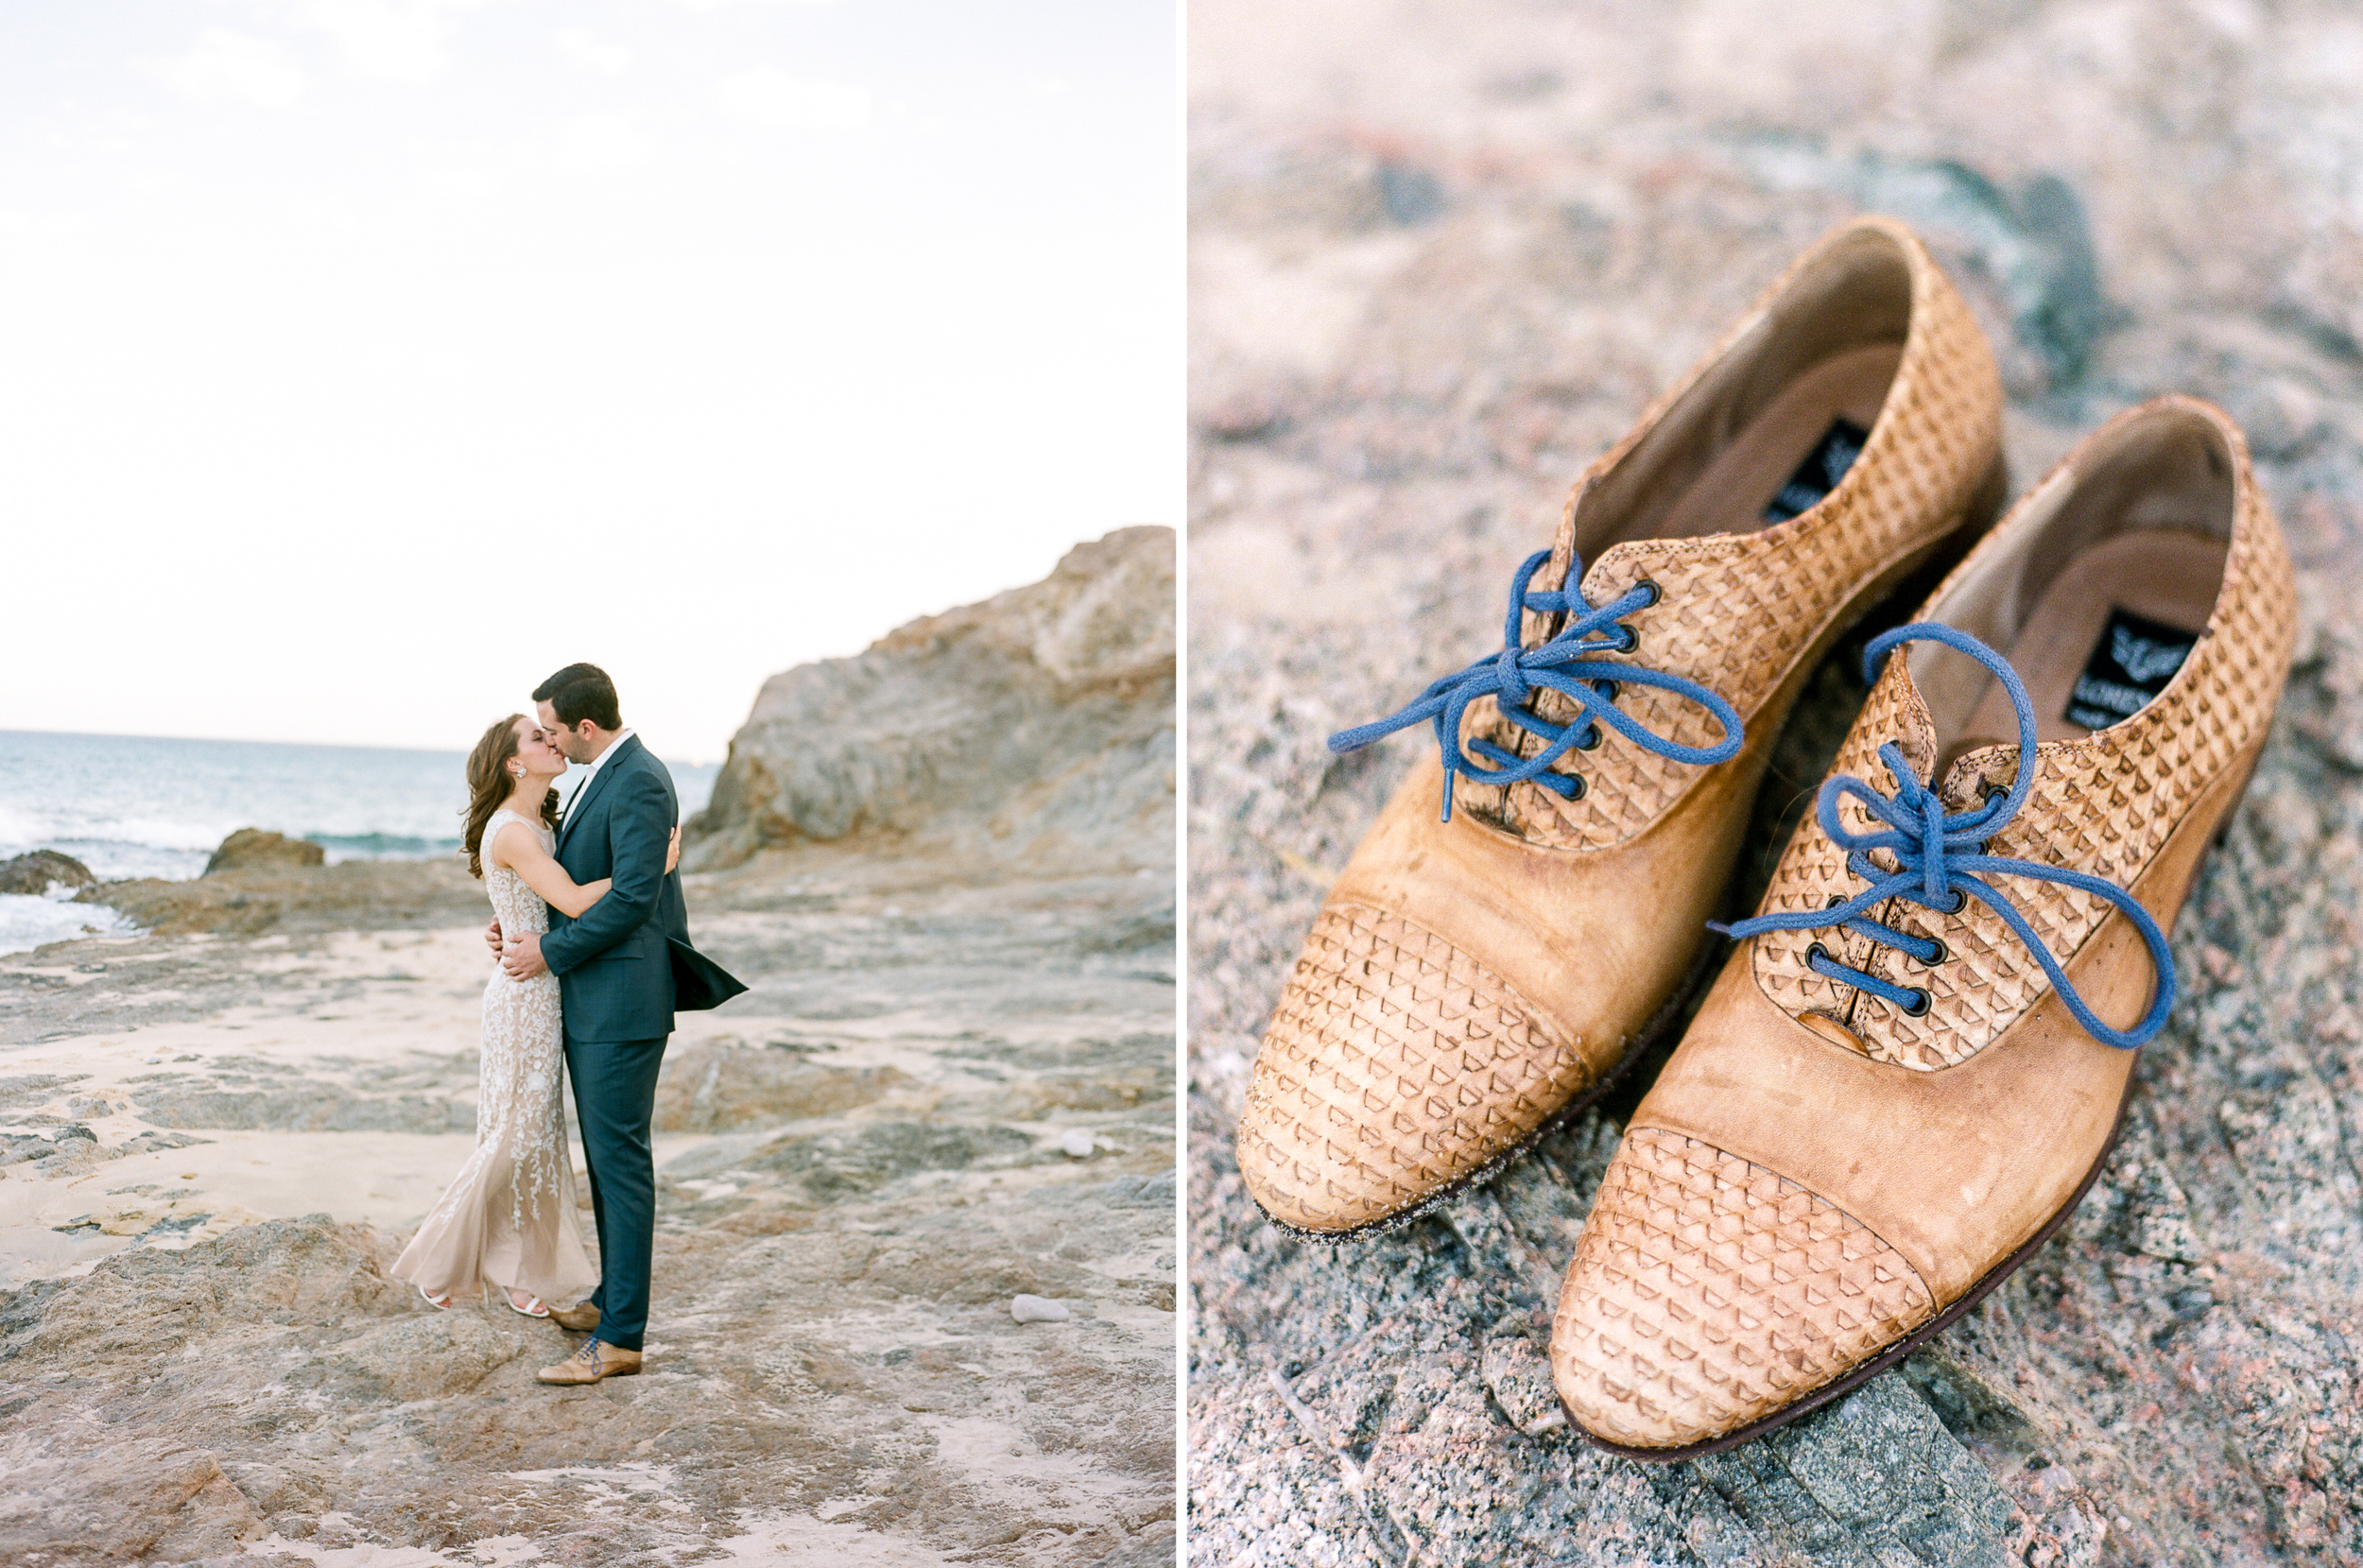 Dana-Fernandez-Photography-Destination-Wedding-Photographer-Cabo-San-Lucas-Film-Houston-Texas-Cabo-108.jpg